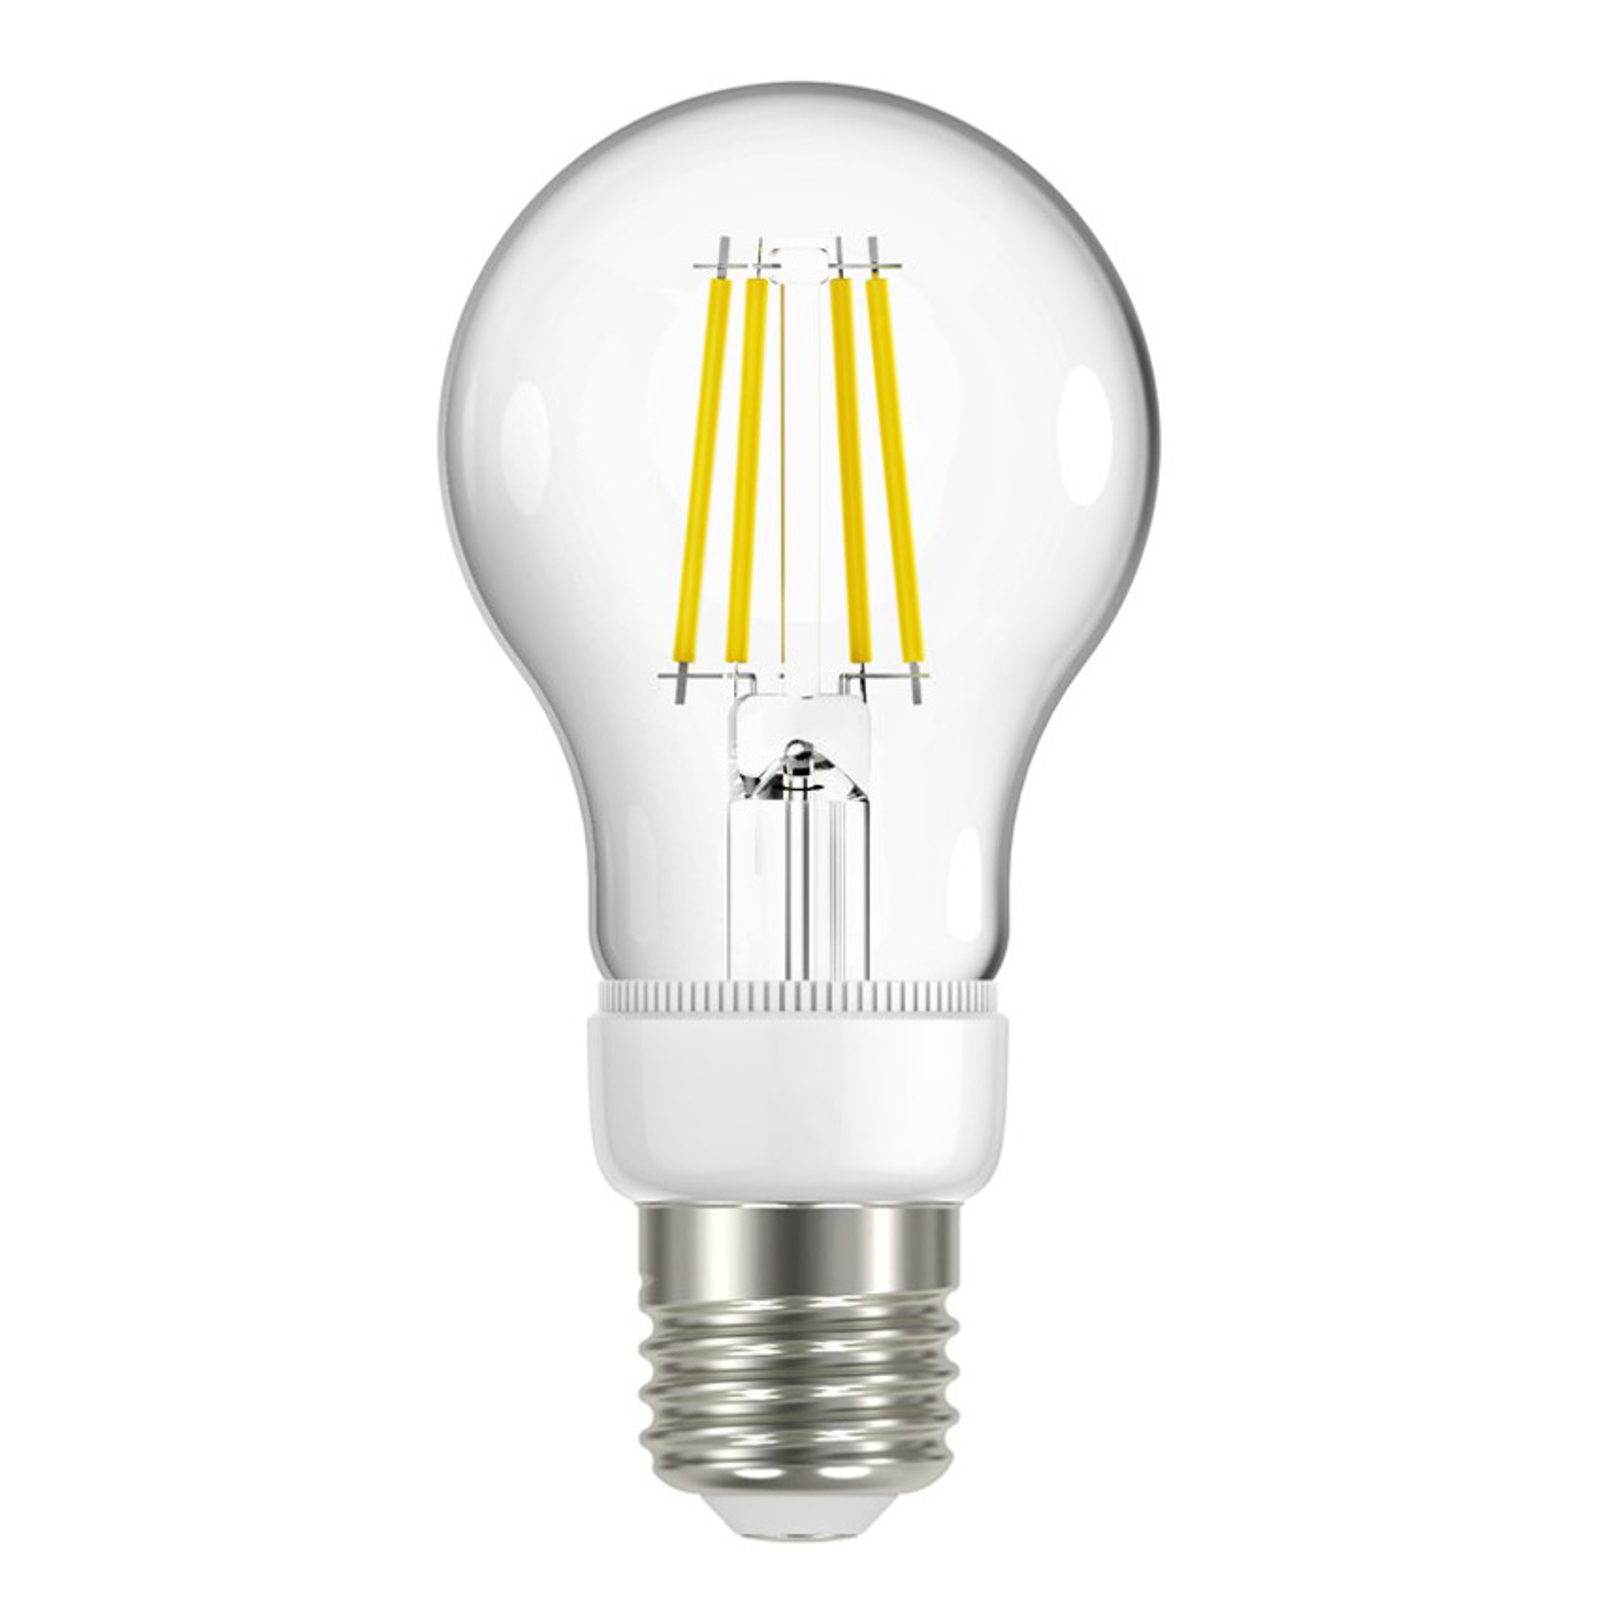 Müller Licht tint white -LED-lamppu E27 5W kirkas